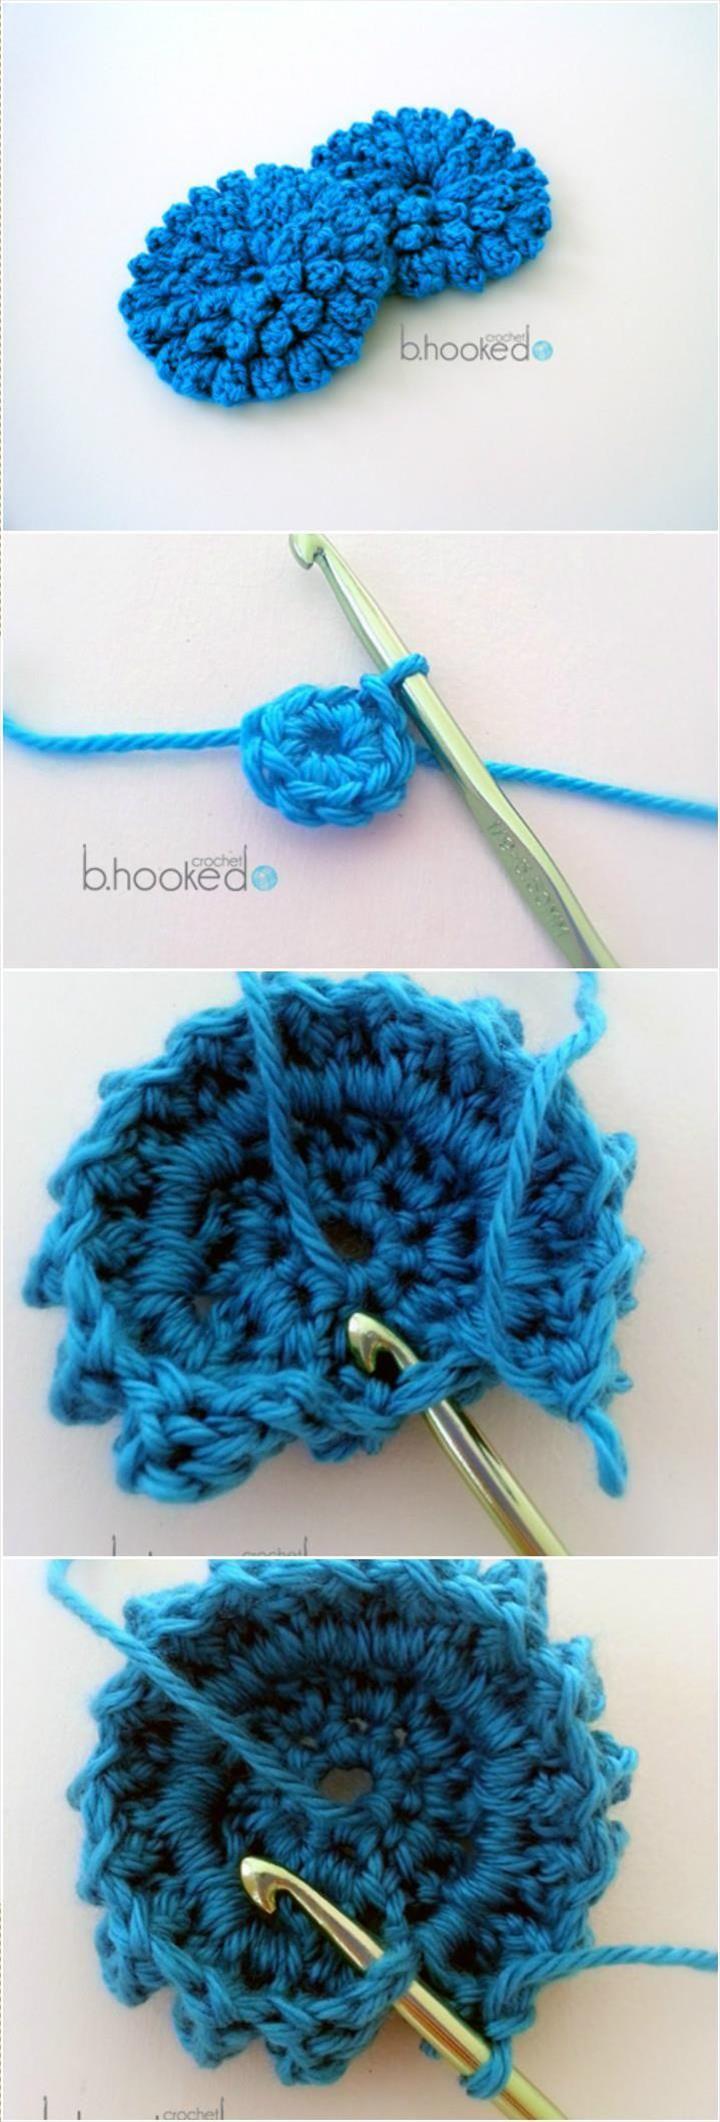 Blue Crochet Popcorn Stitch Flower - 31 Free Crochet Patterns That You will in Love with   101 Crochet